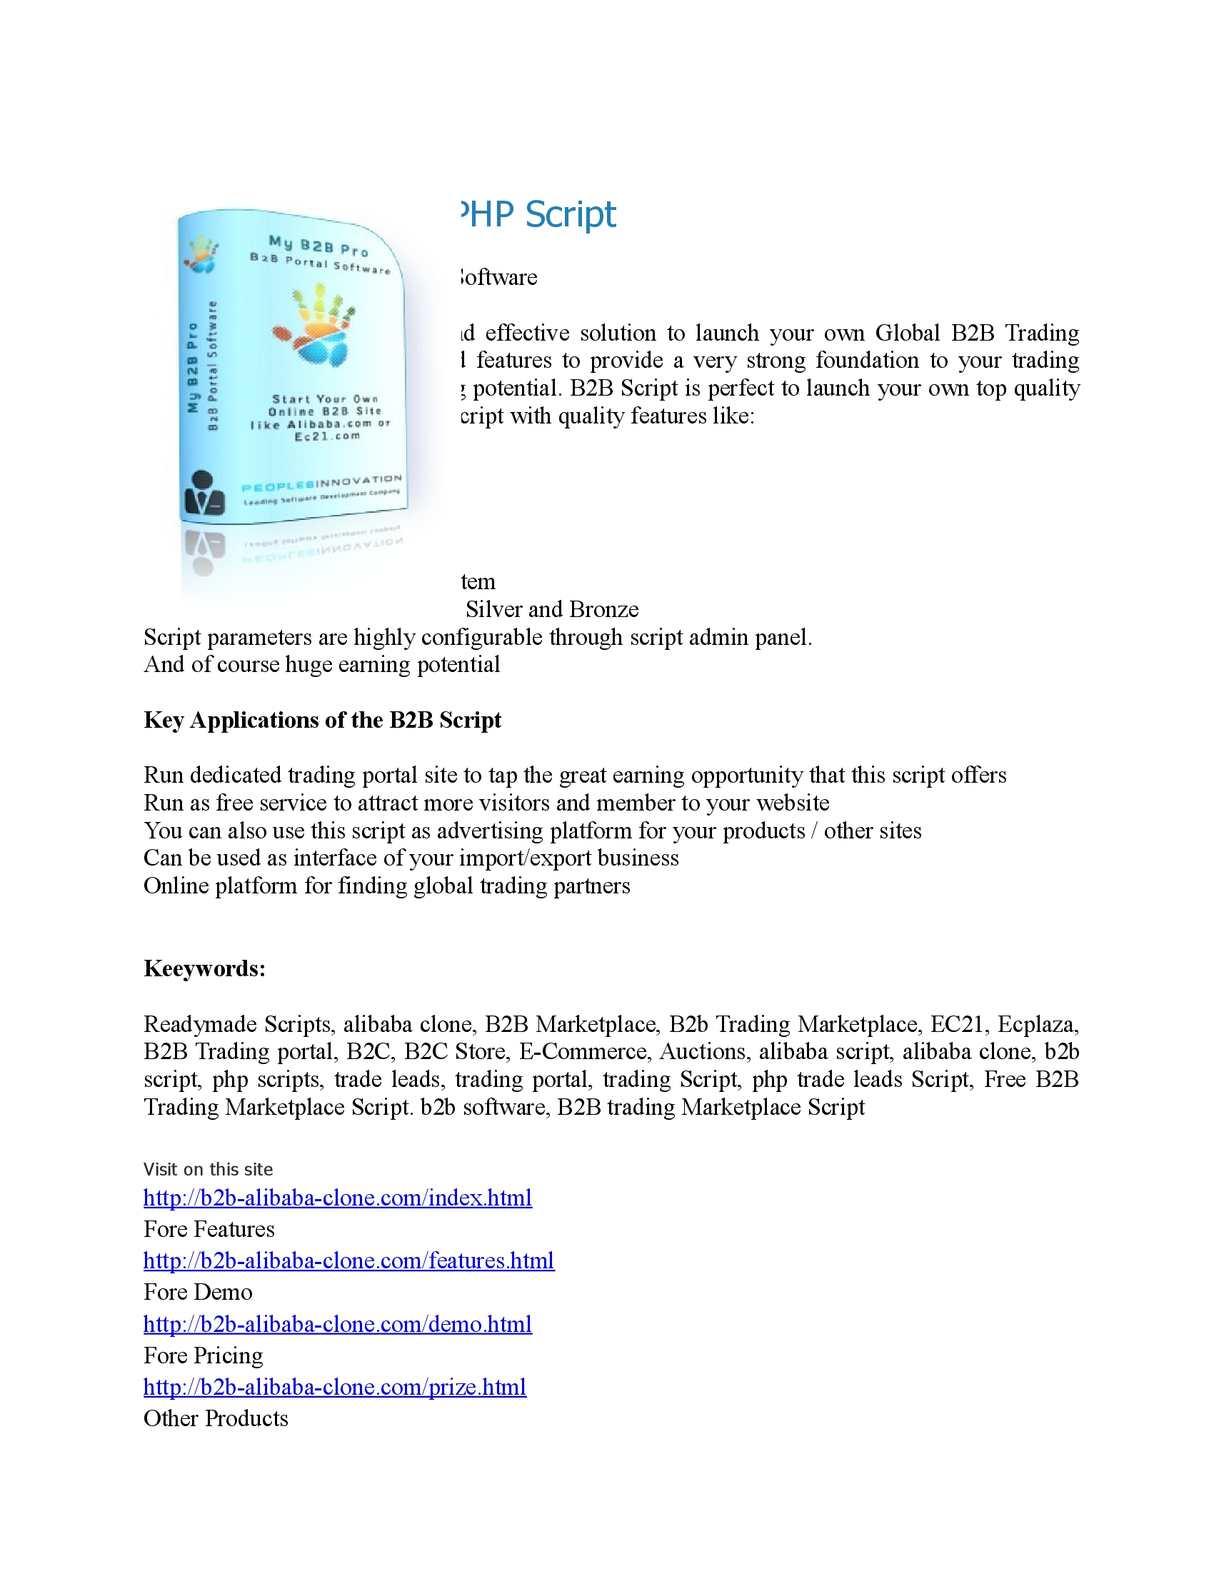 Calaméo - Alibaba Clone Script Best B2B Software